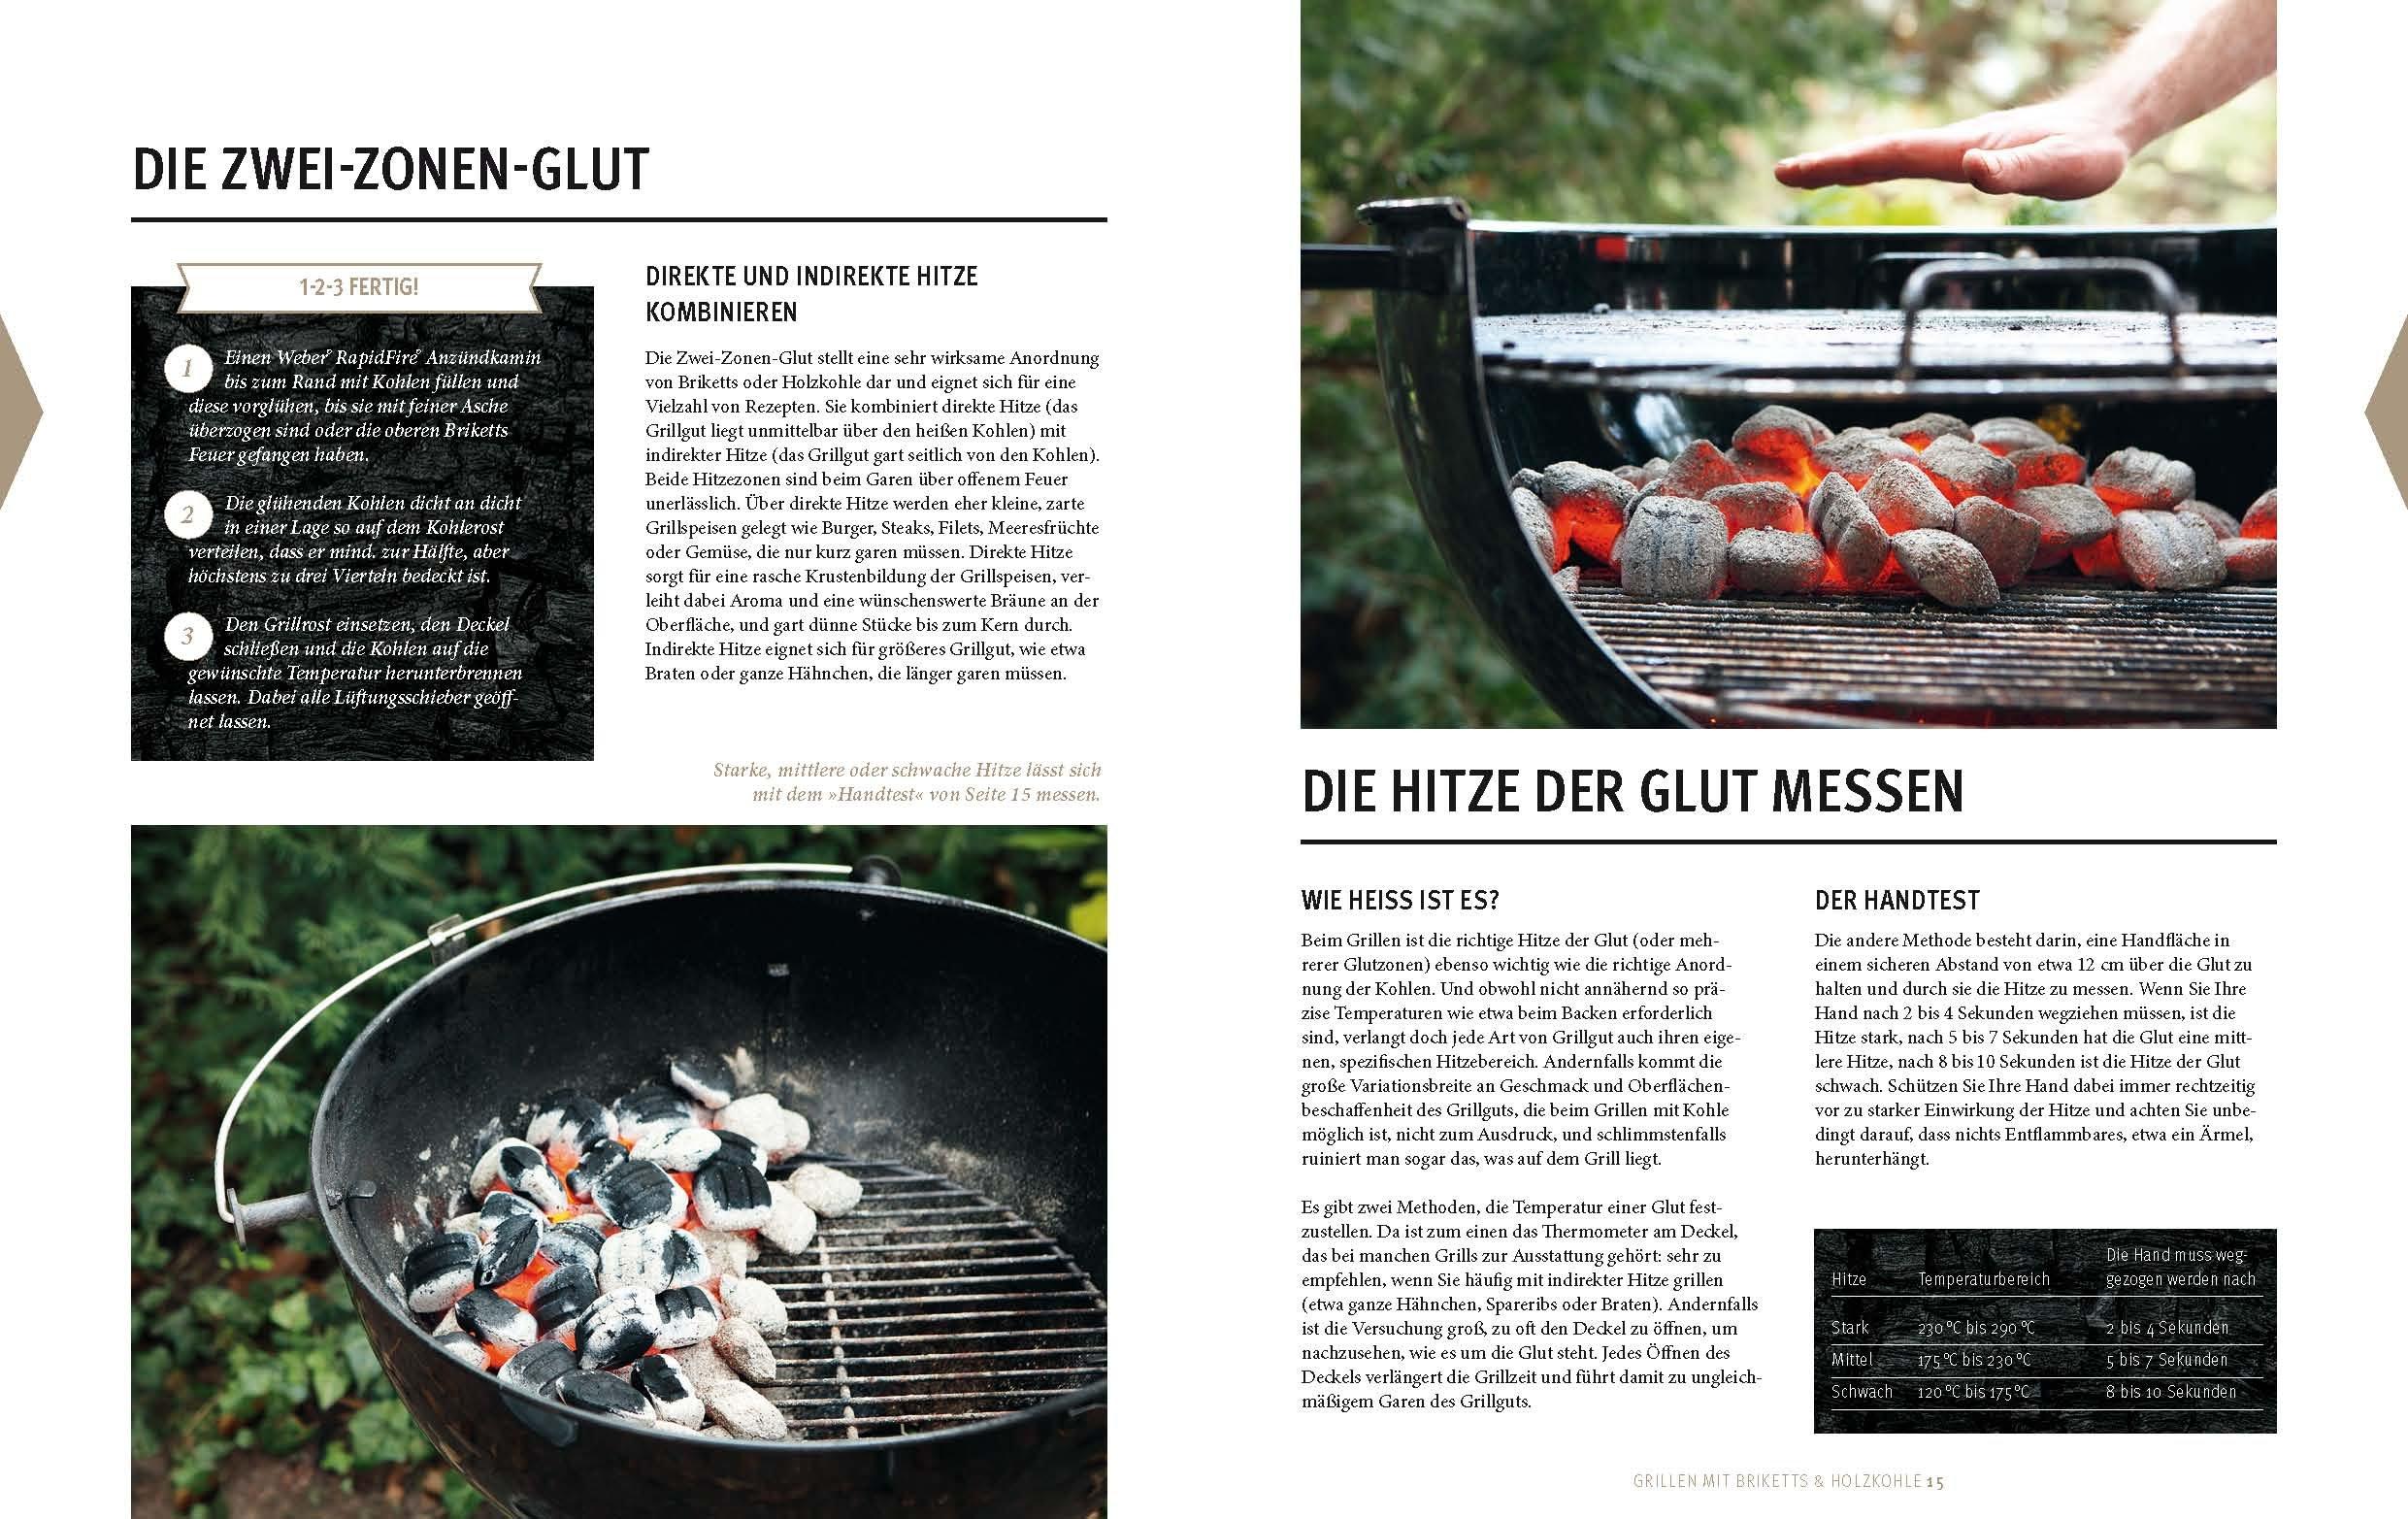 Weber Holzkohlegrill Welche Temperatur : Weber s grillen mit briketts holzkohle gu weber s grillen